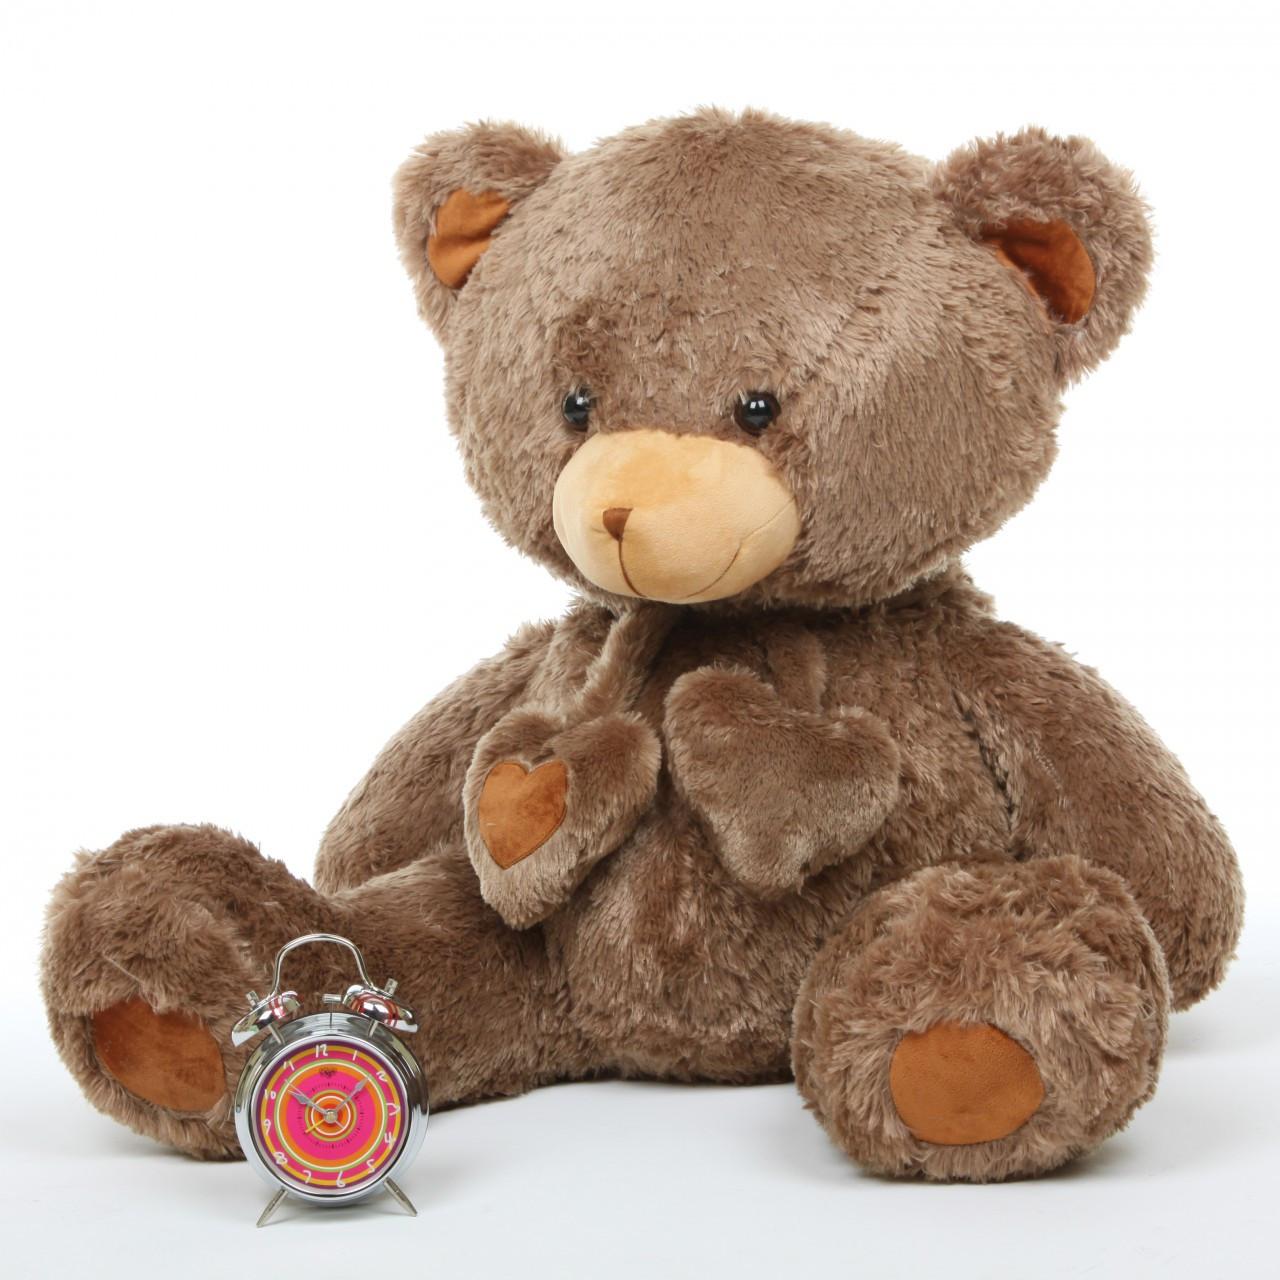 Cheaky Hugs 36 Mocha Brown Big Stuffed Teddy Bear Giant